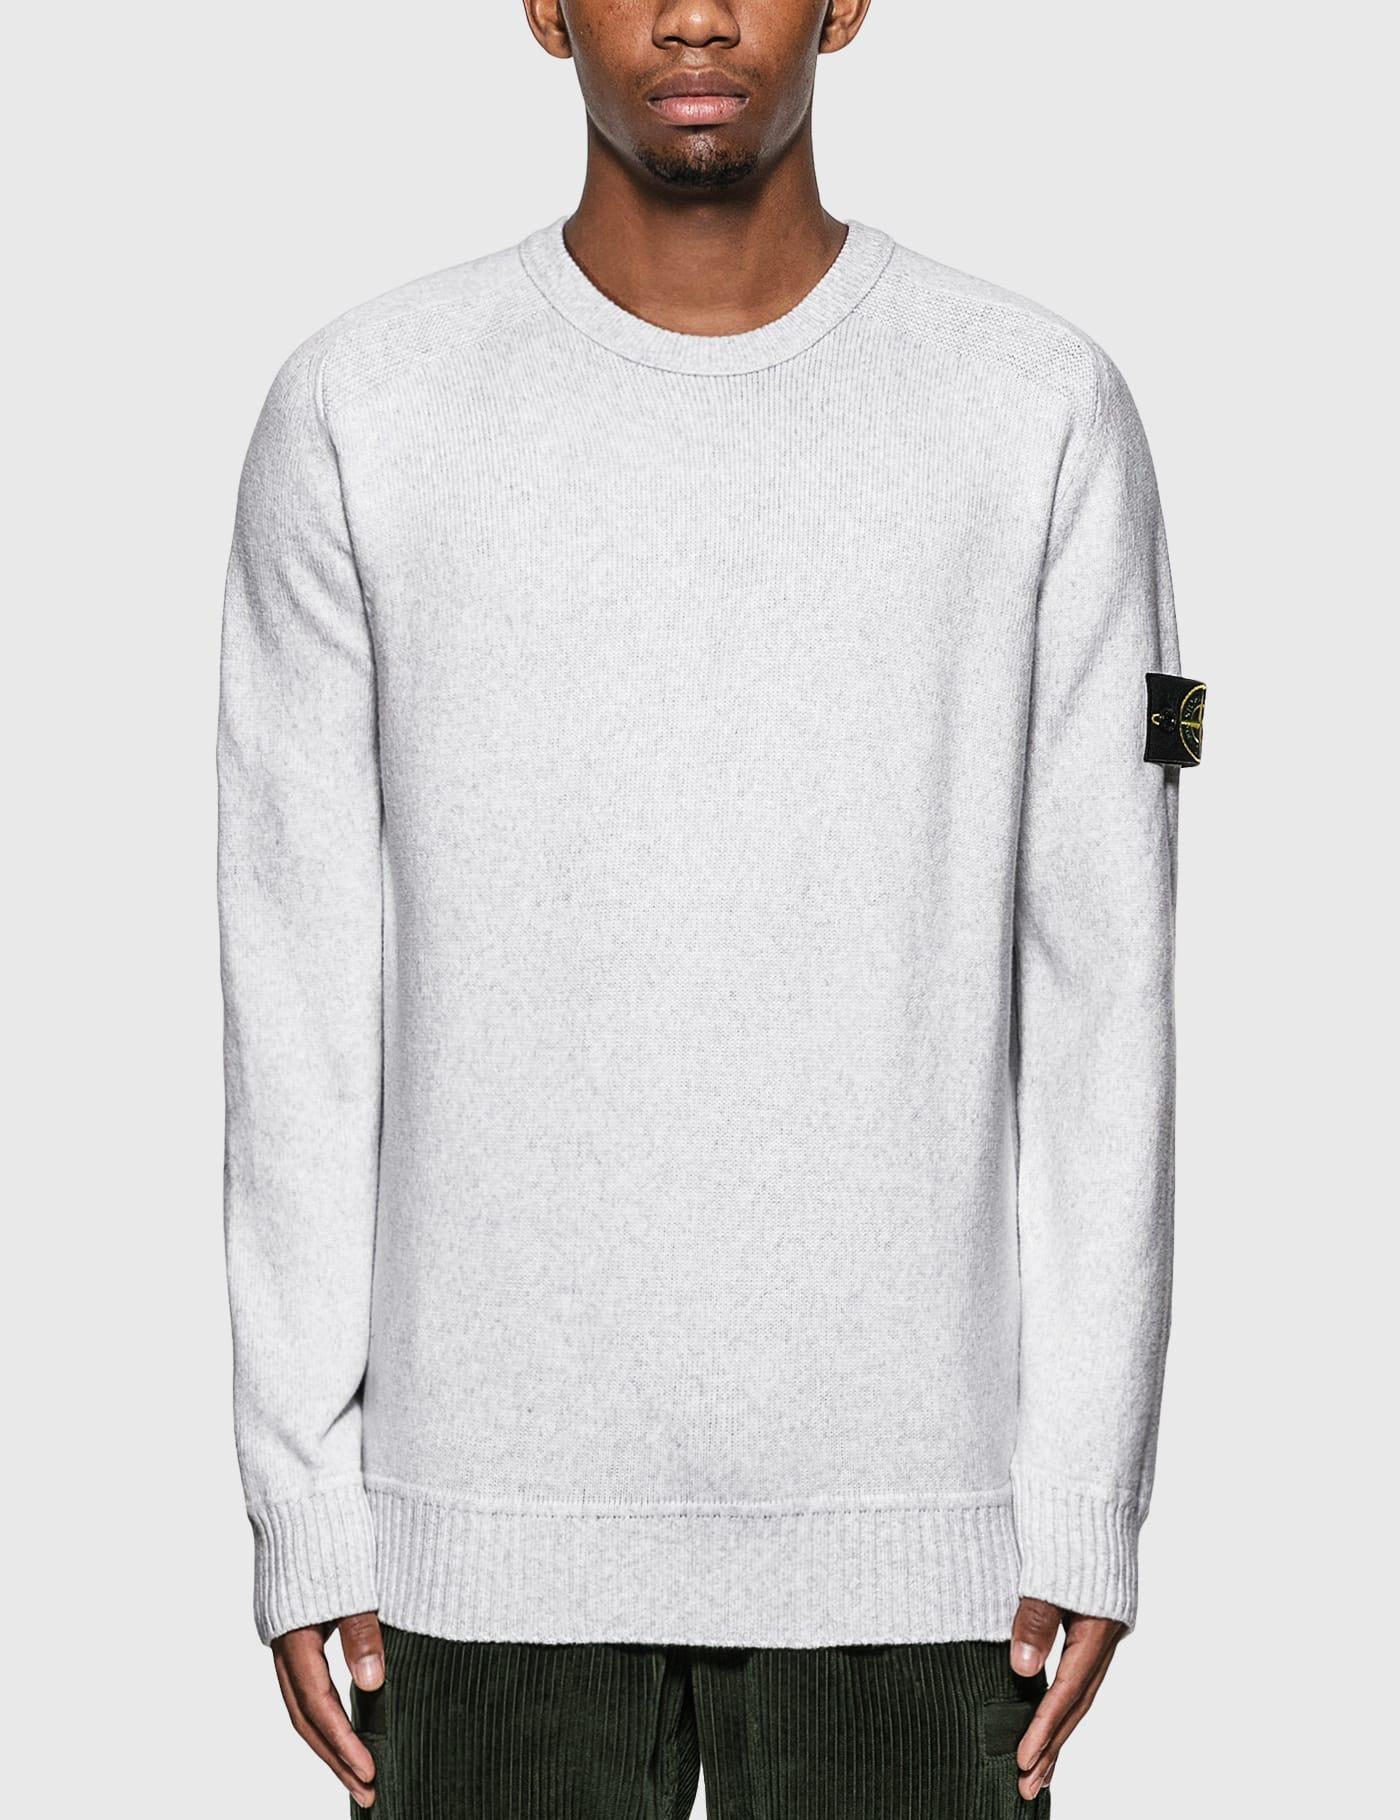 Cotton Blend Compass Patch Logo Sweater